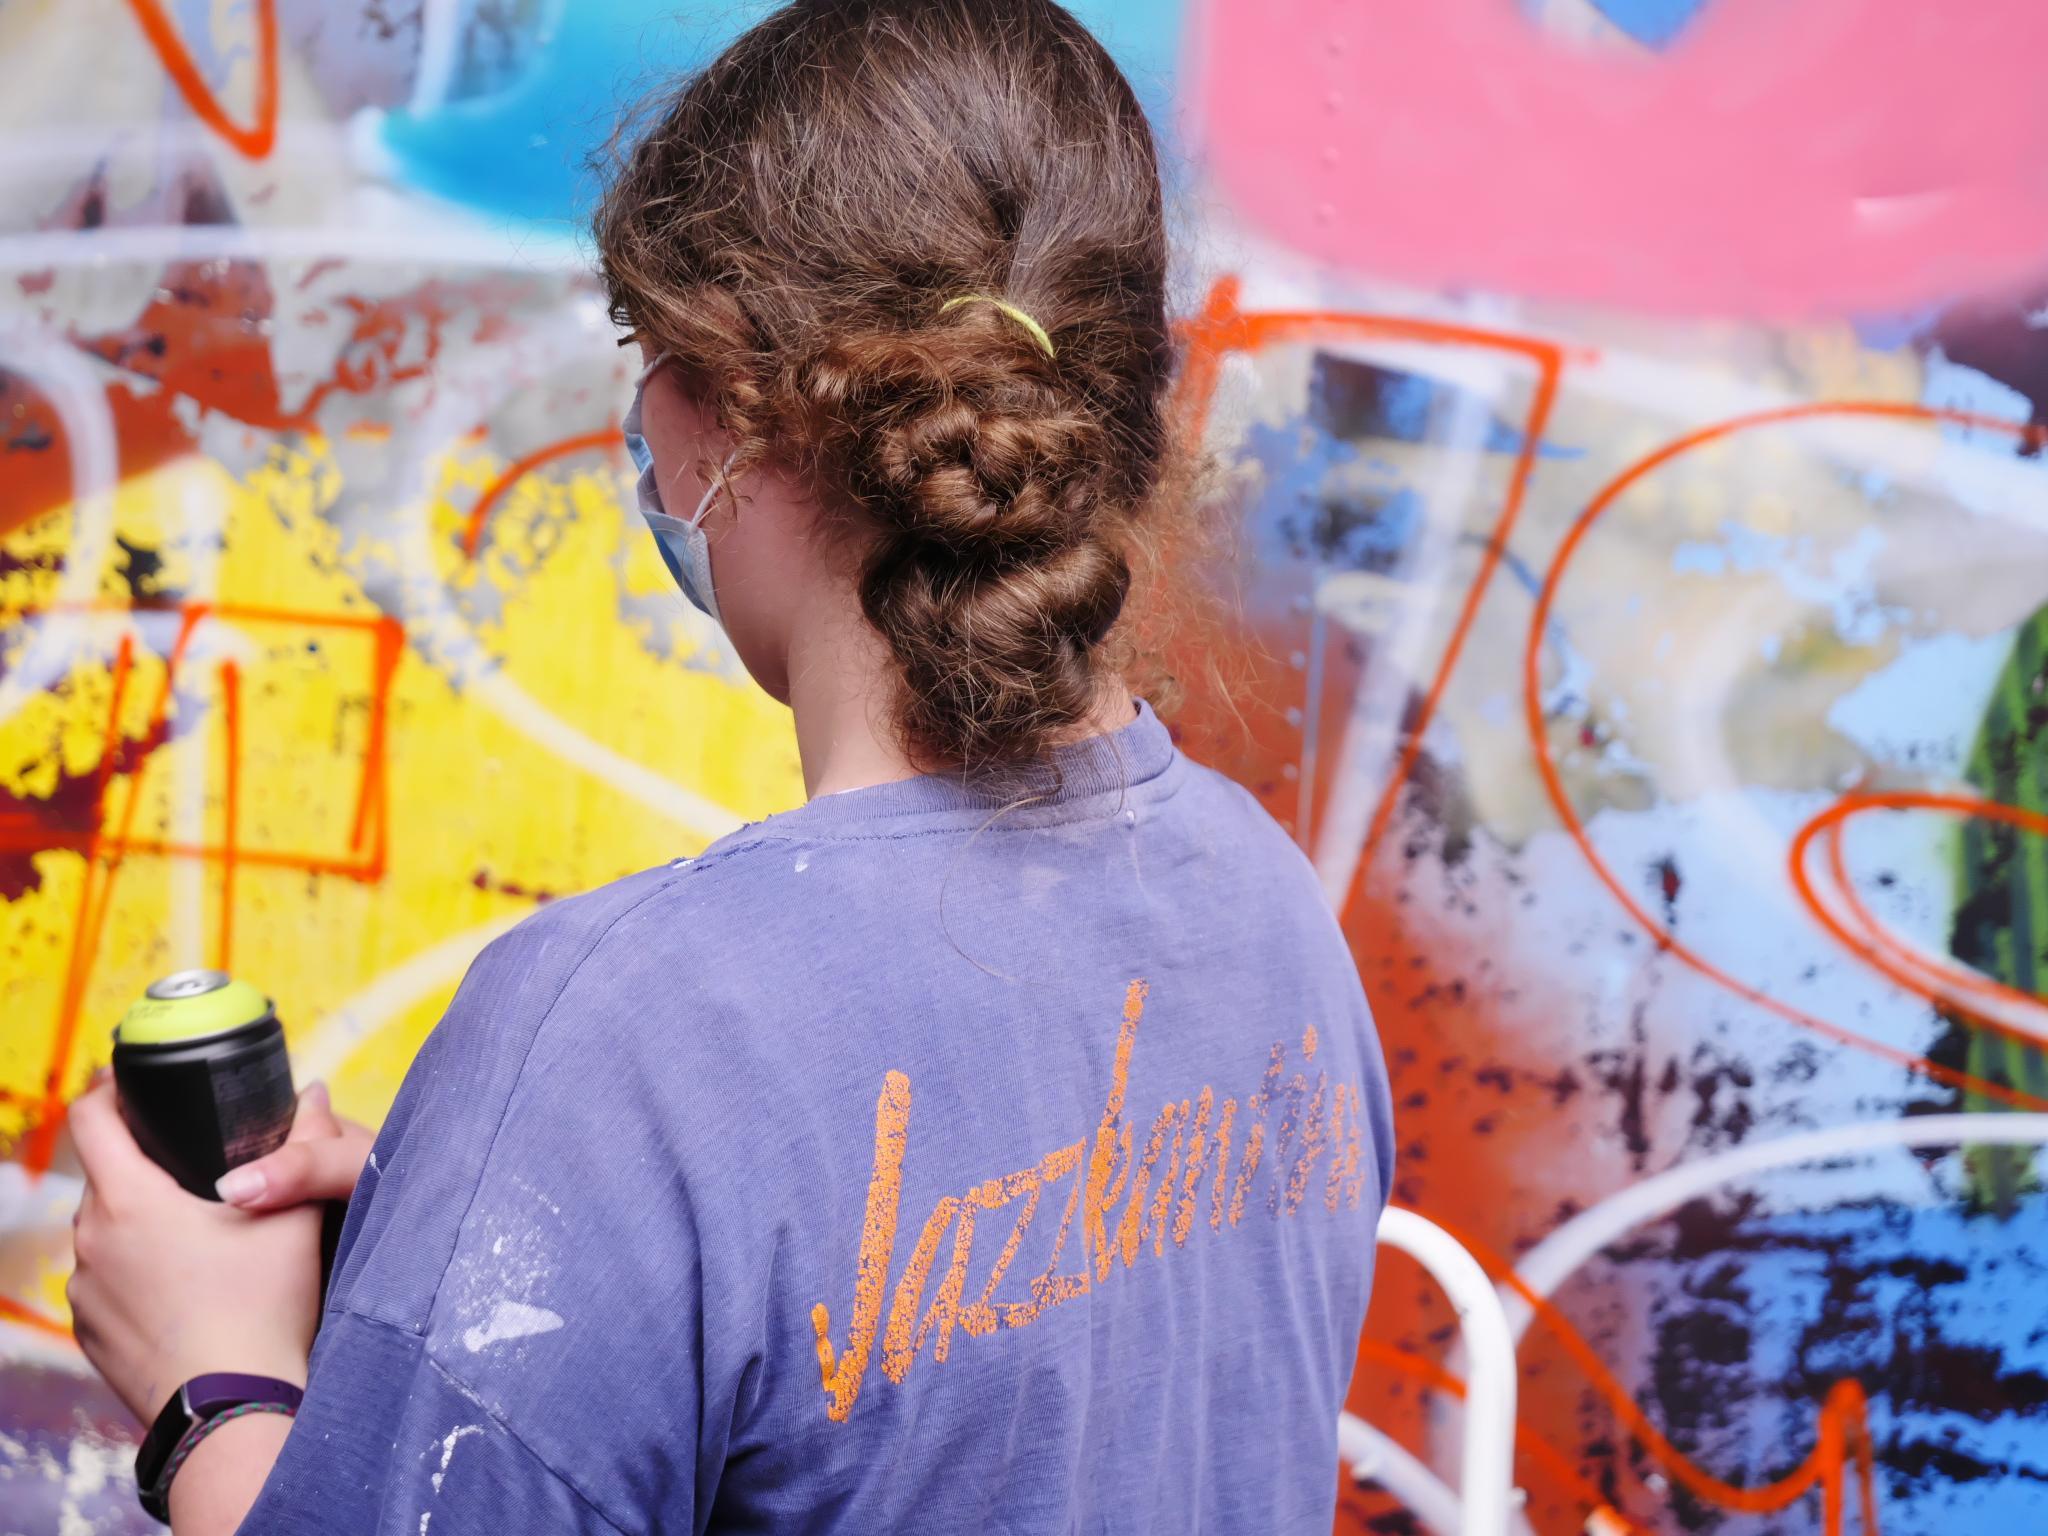 jugendkulturjahr-2020-ratingen-jkj2020-Graffitiworksjop-Bild20